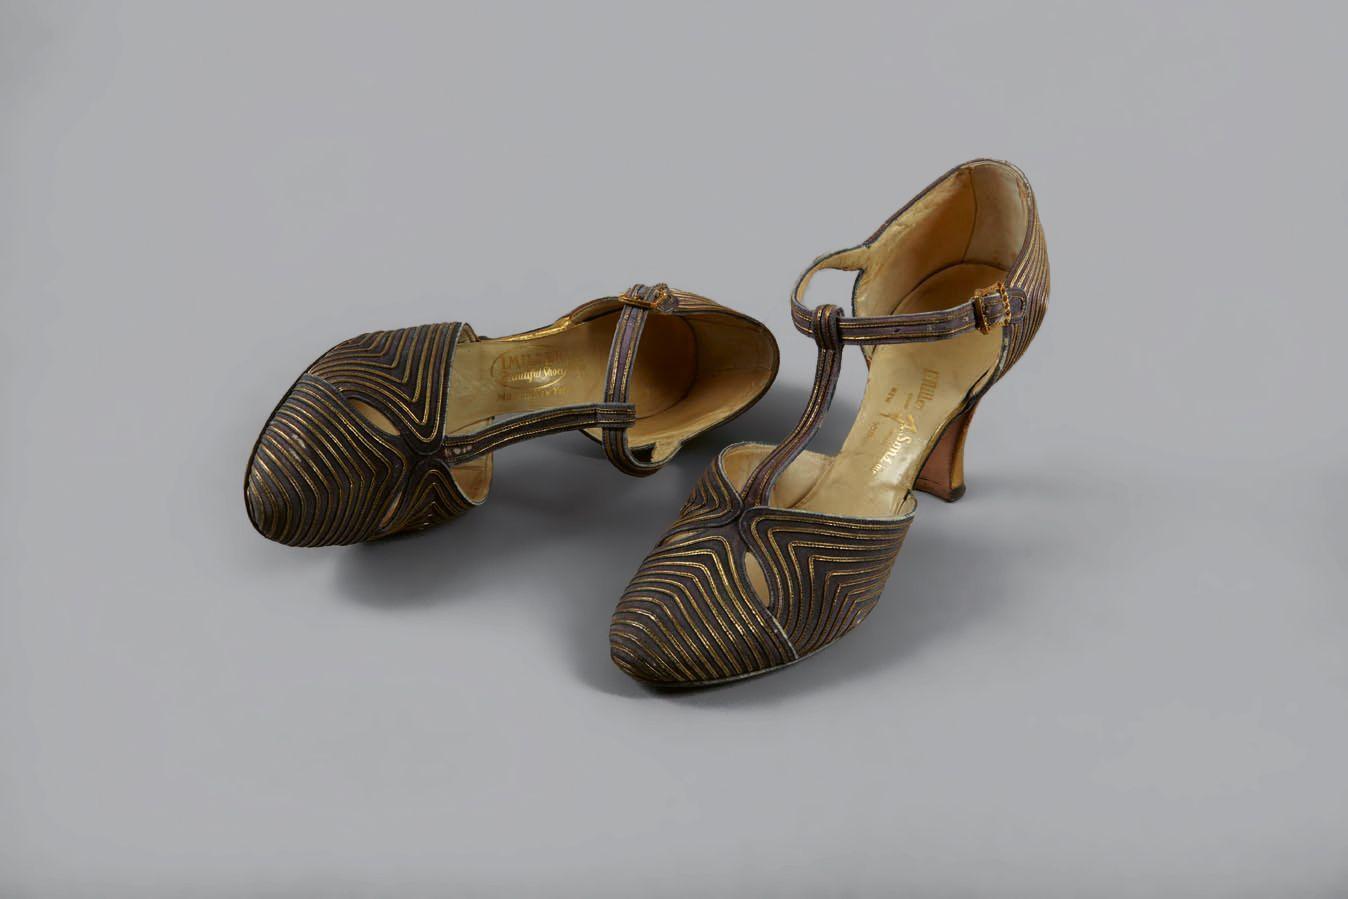 Stegspangenpumps, I. Miller, New York, USA, 1920–1930 © DLM, M. Özkilinc